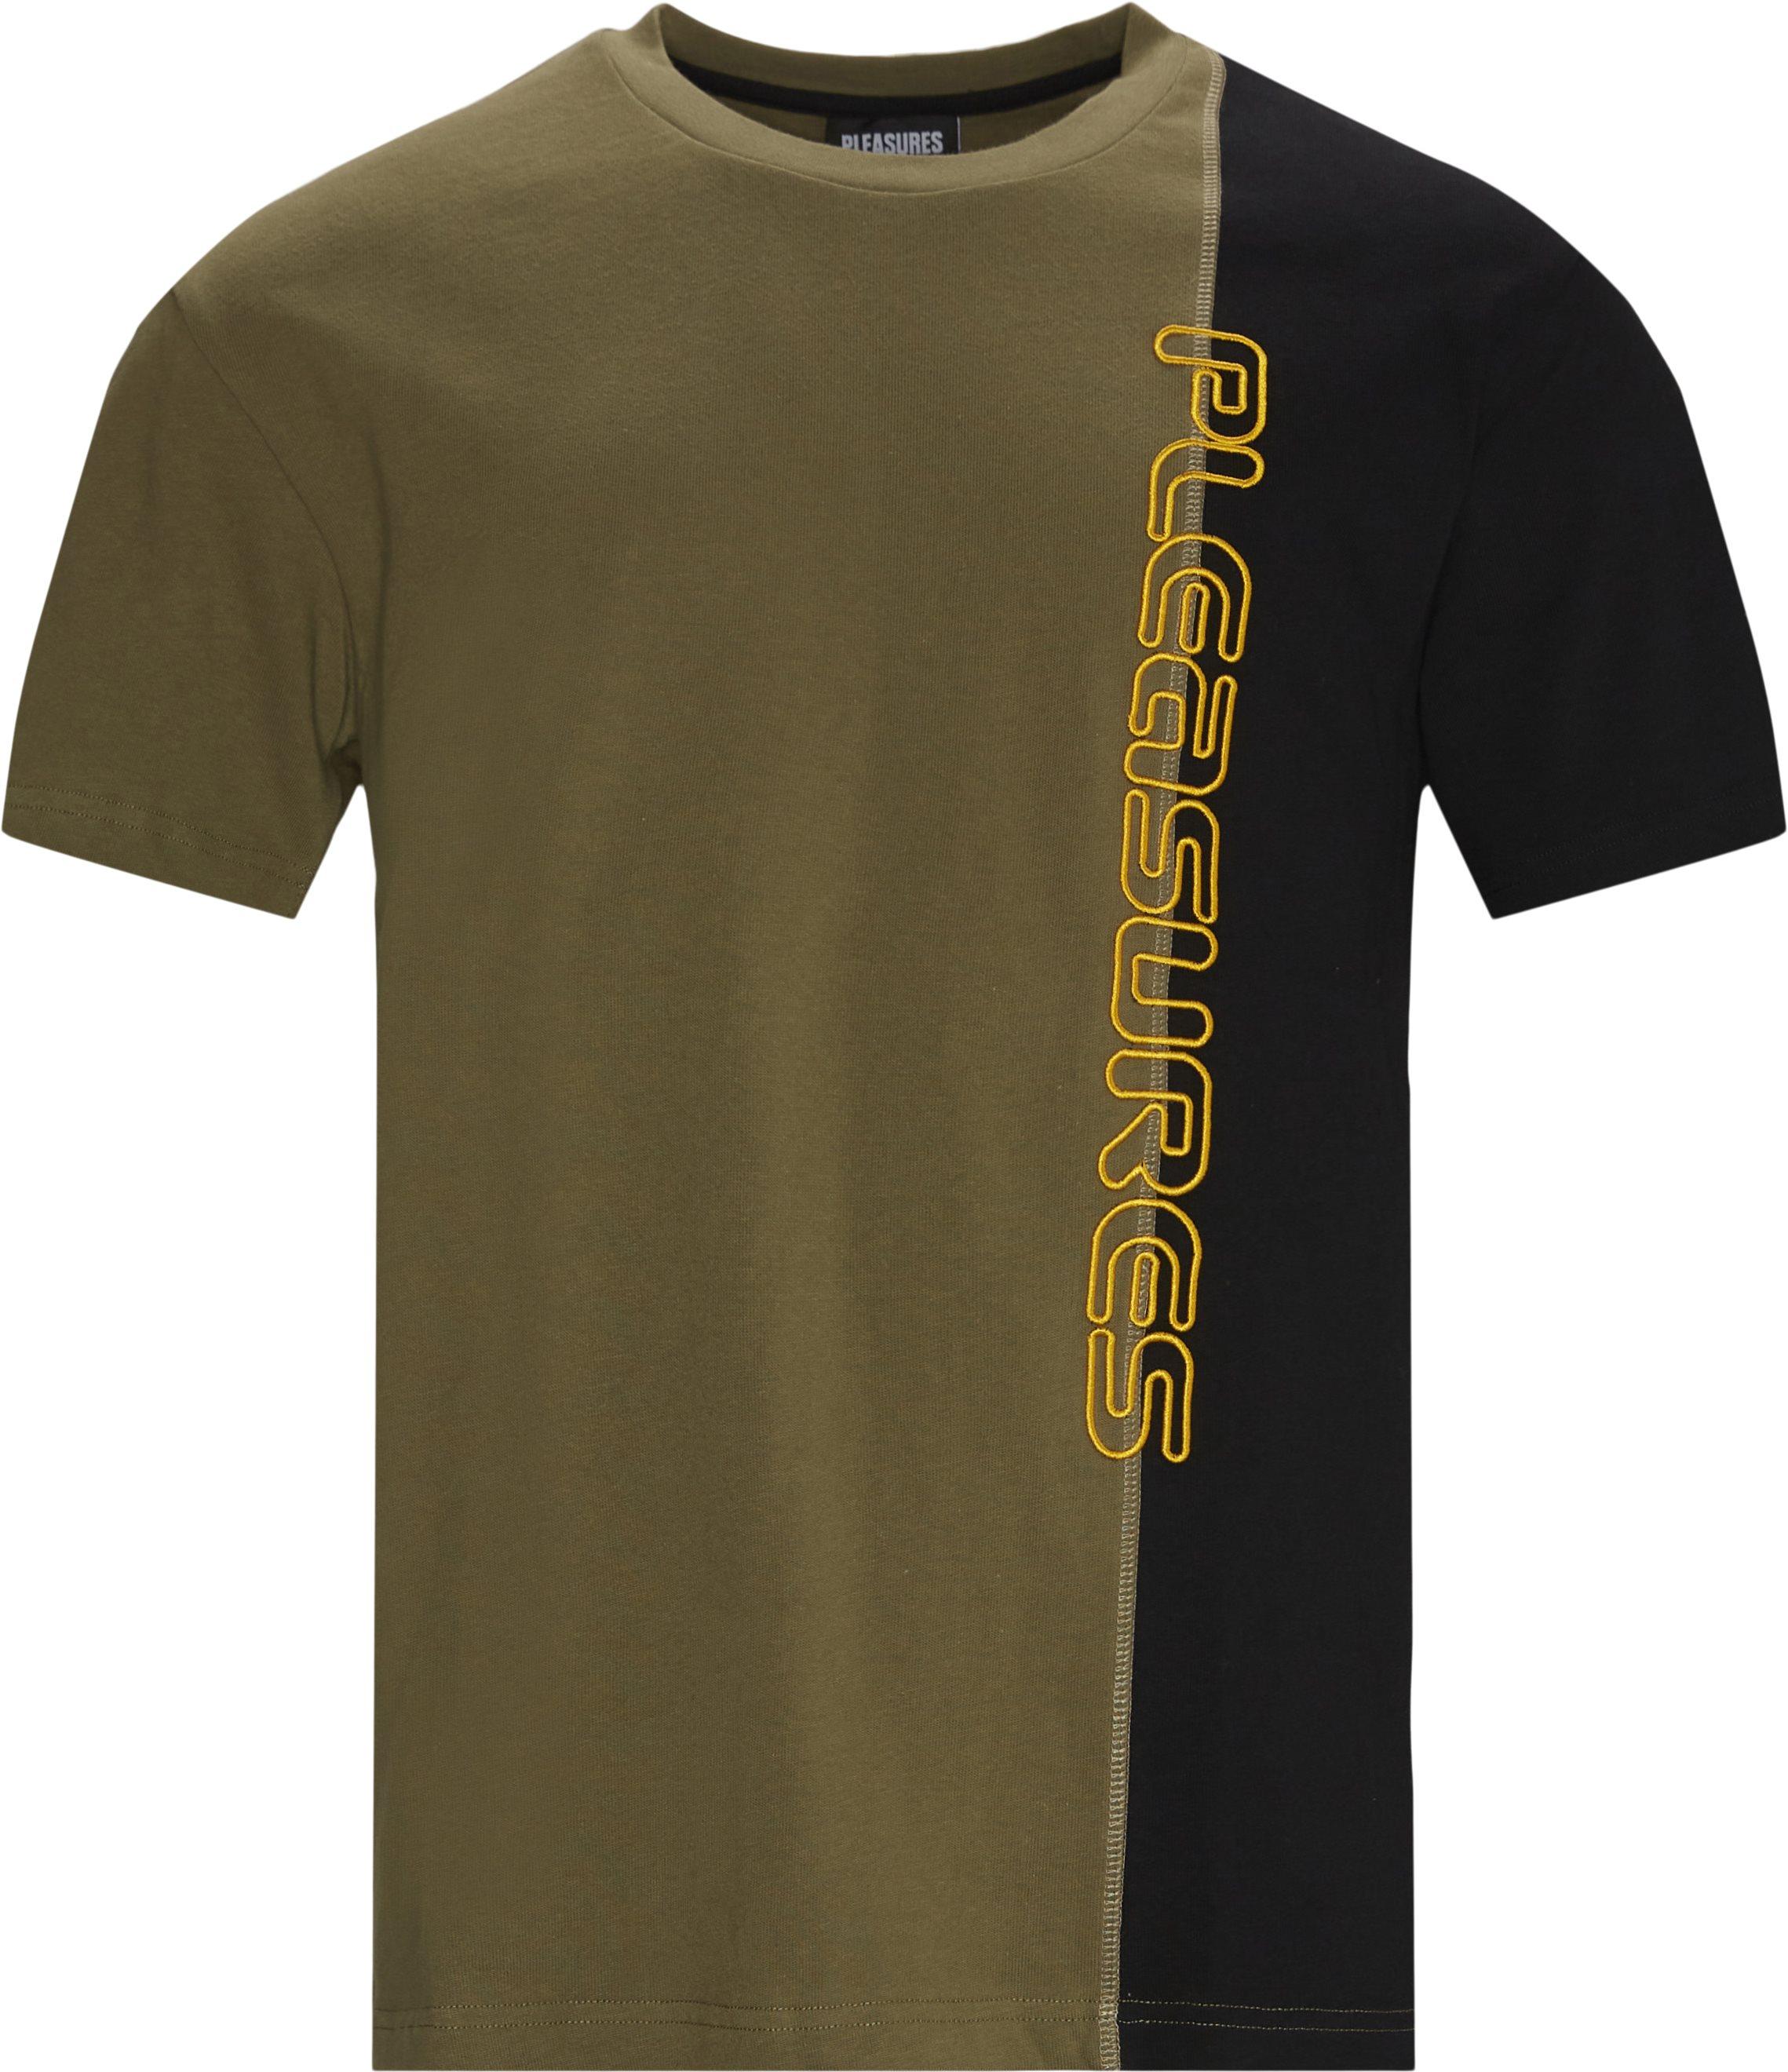 Reality Split Tee - T-shirts - Regular fit - Sort